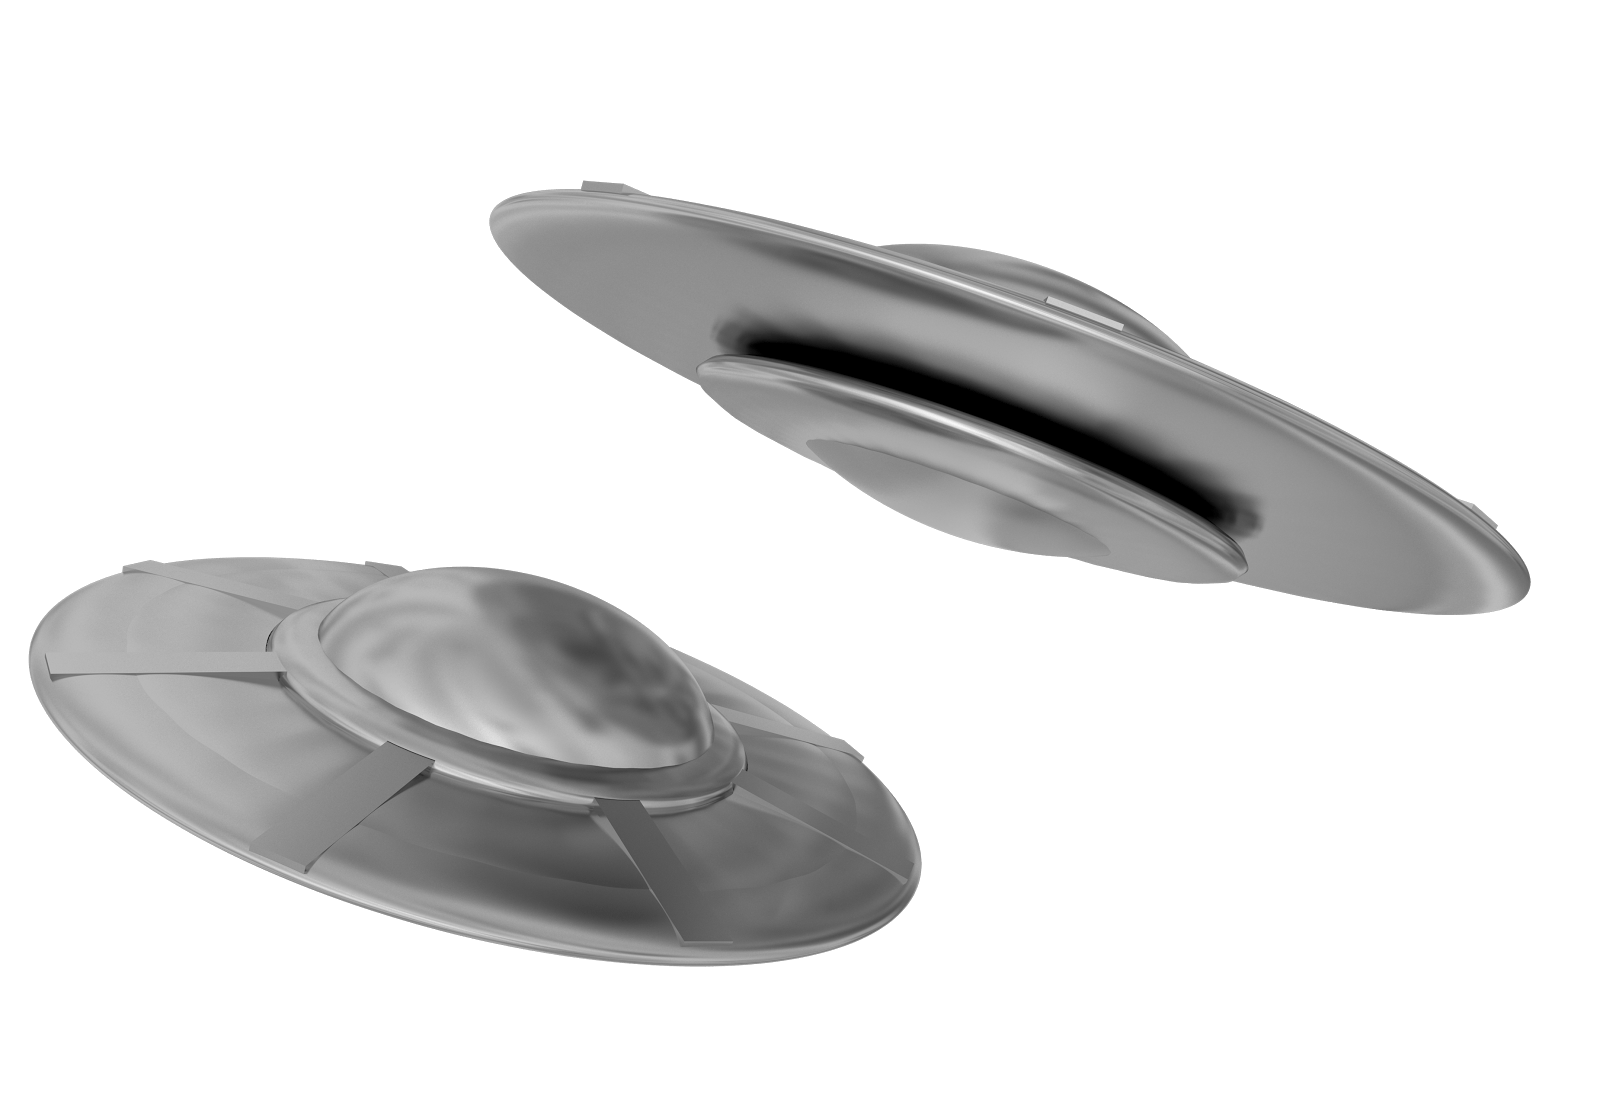 Ufo transparent background